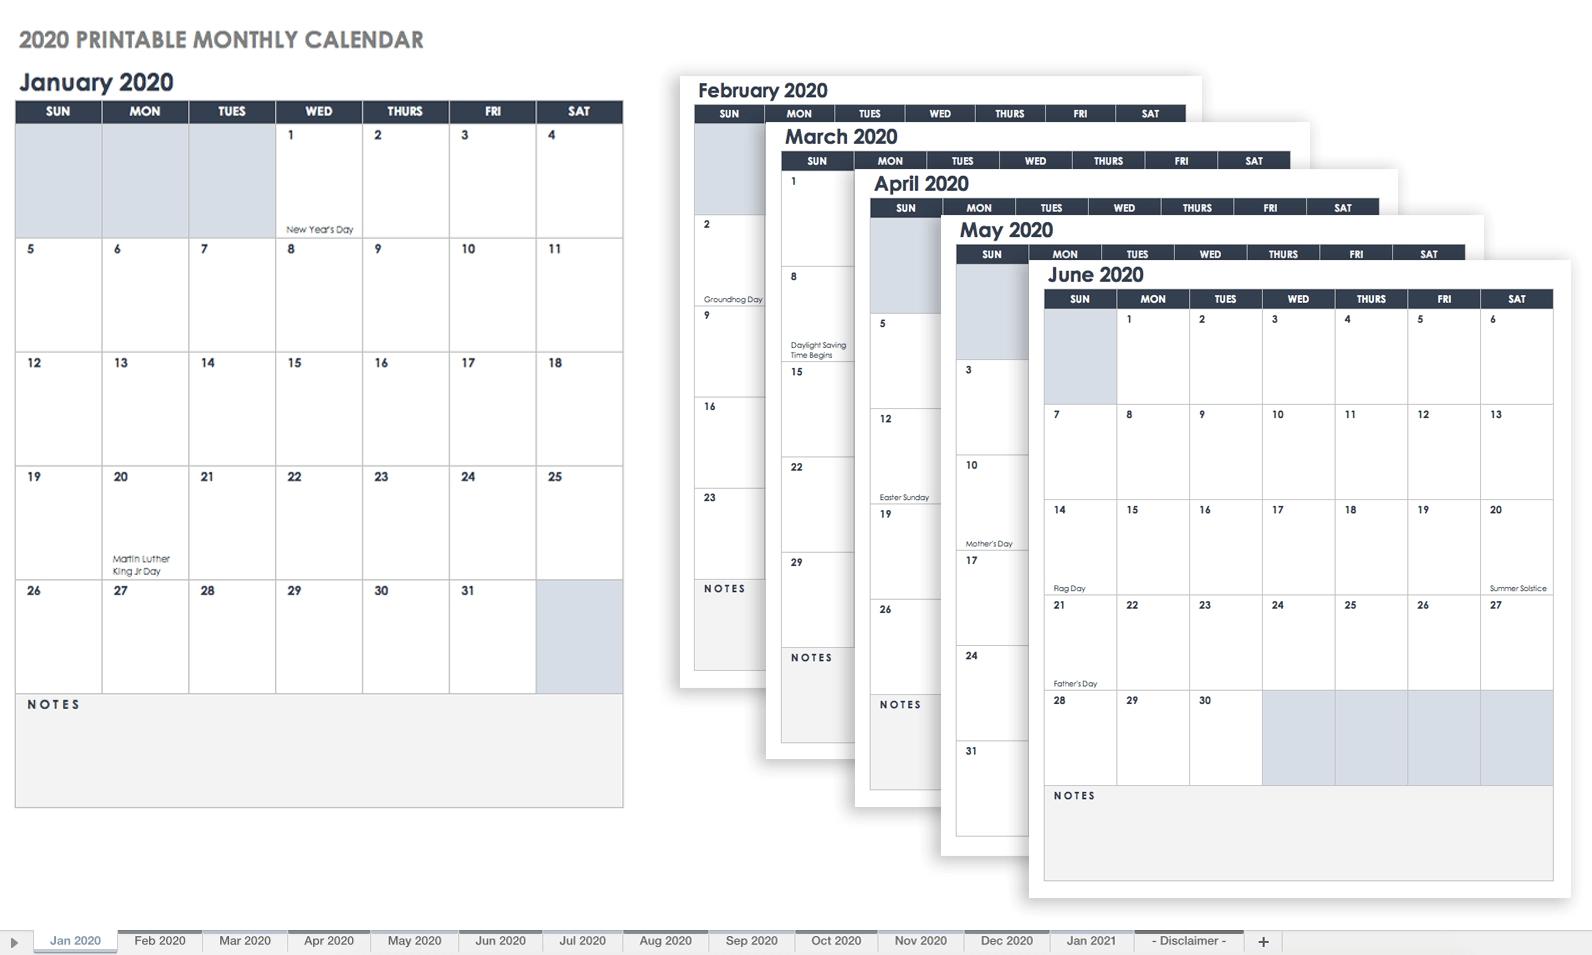 Free Blank Calendar Templates - Smartsheet regarding Free Printable Monthly Calendar Template